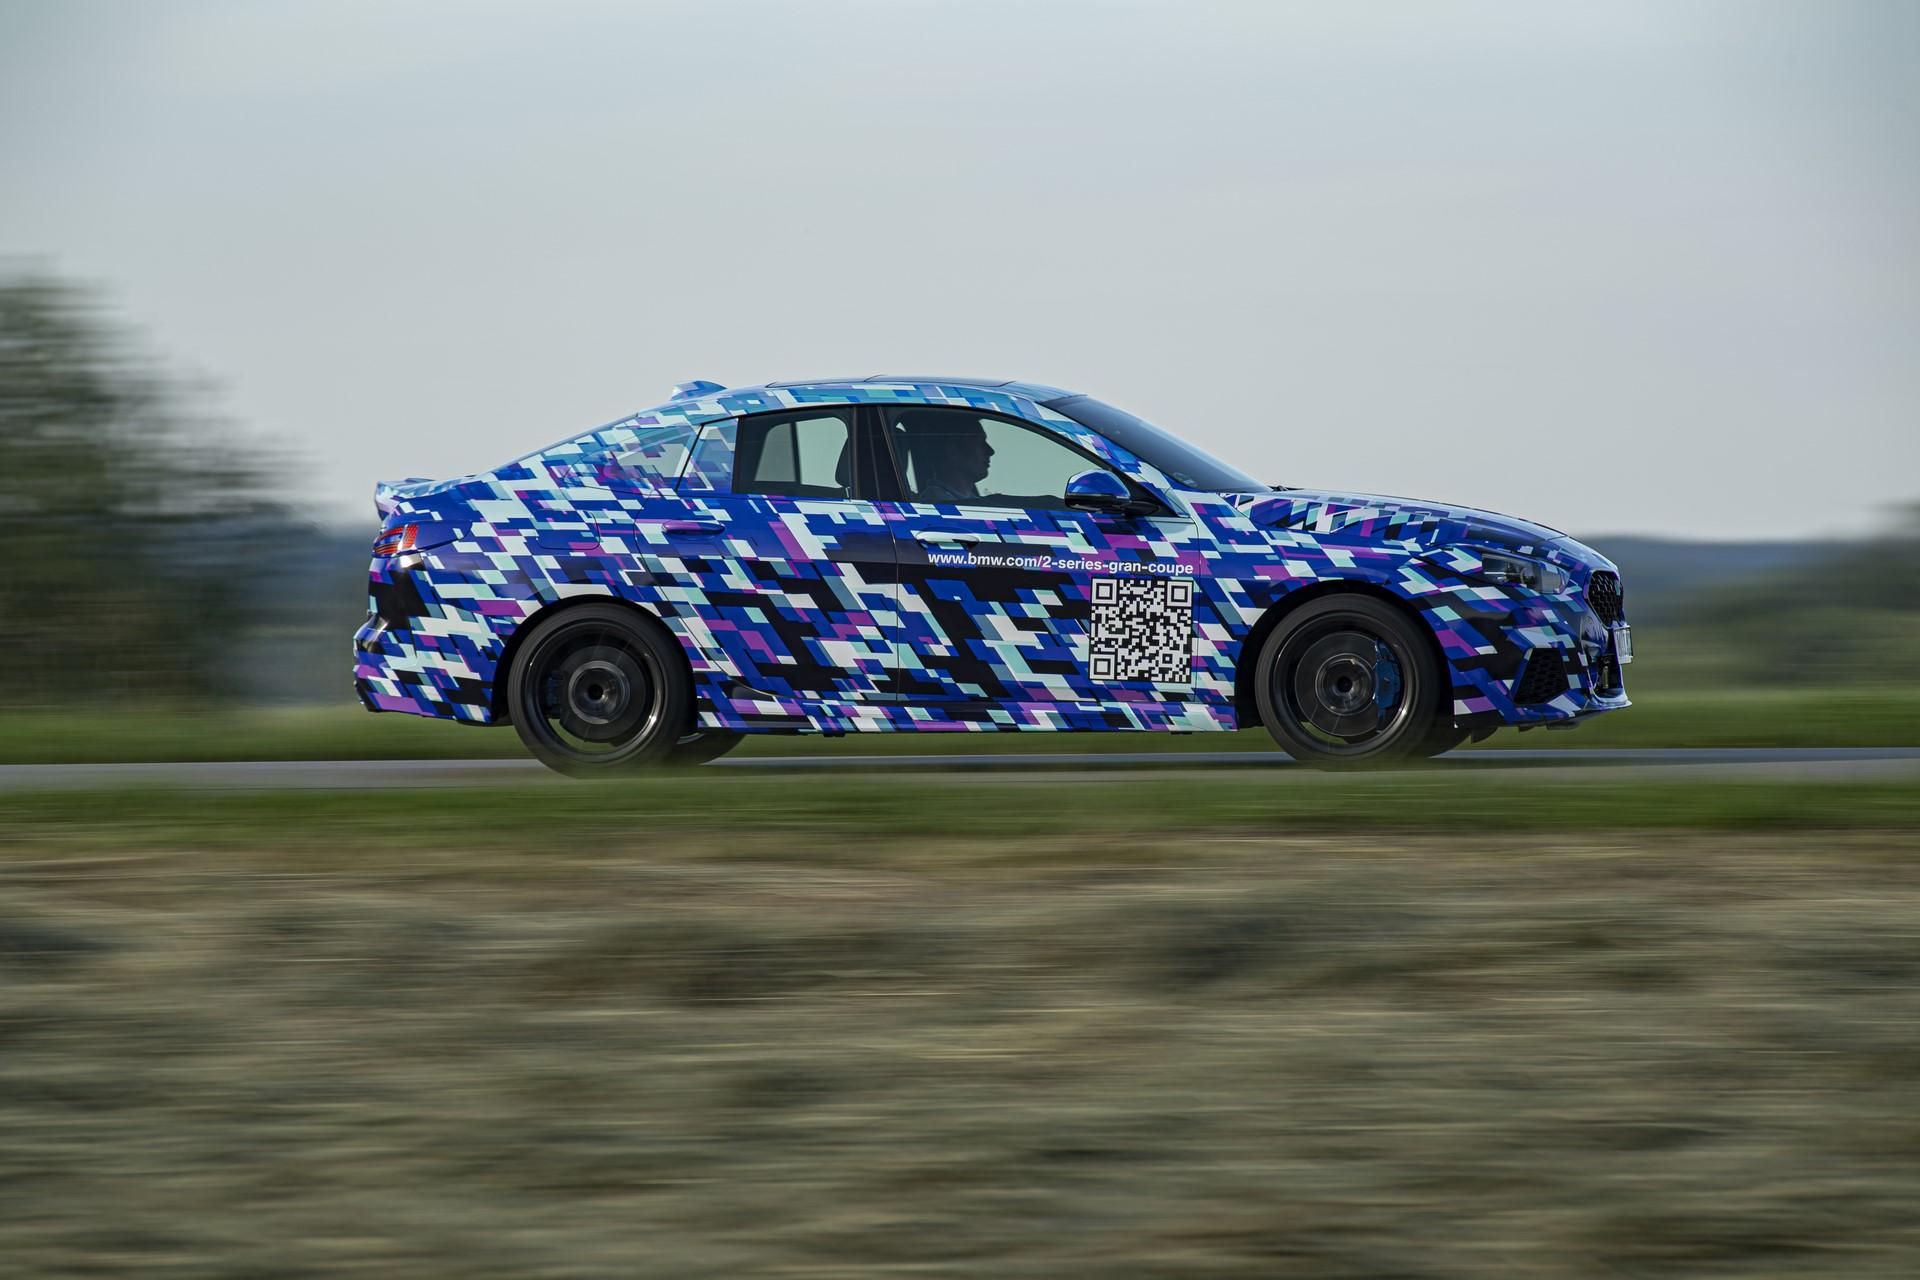 BMW-2-Series-Gran-Coupe-2020-spy-photos-9